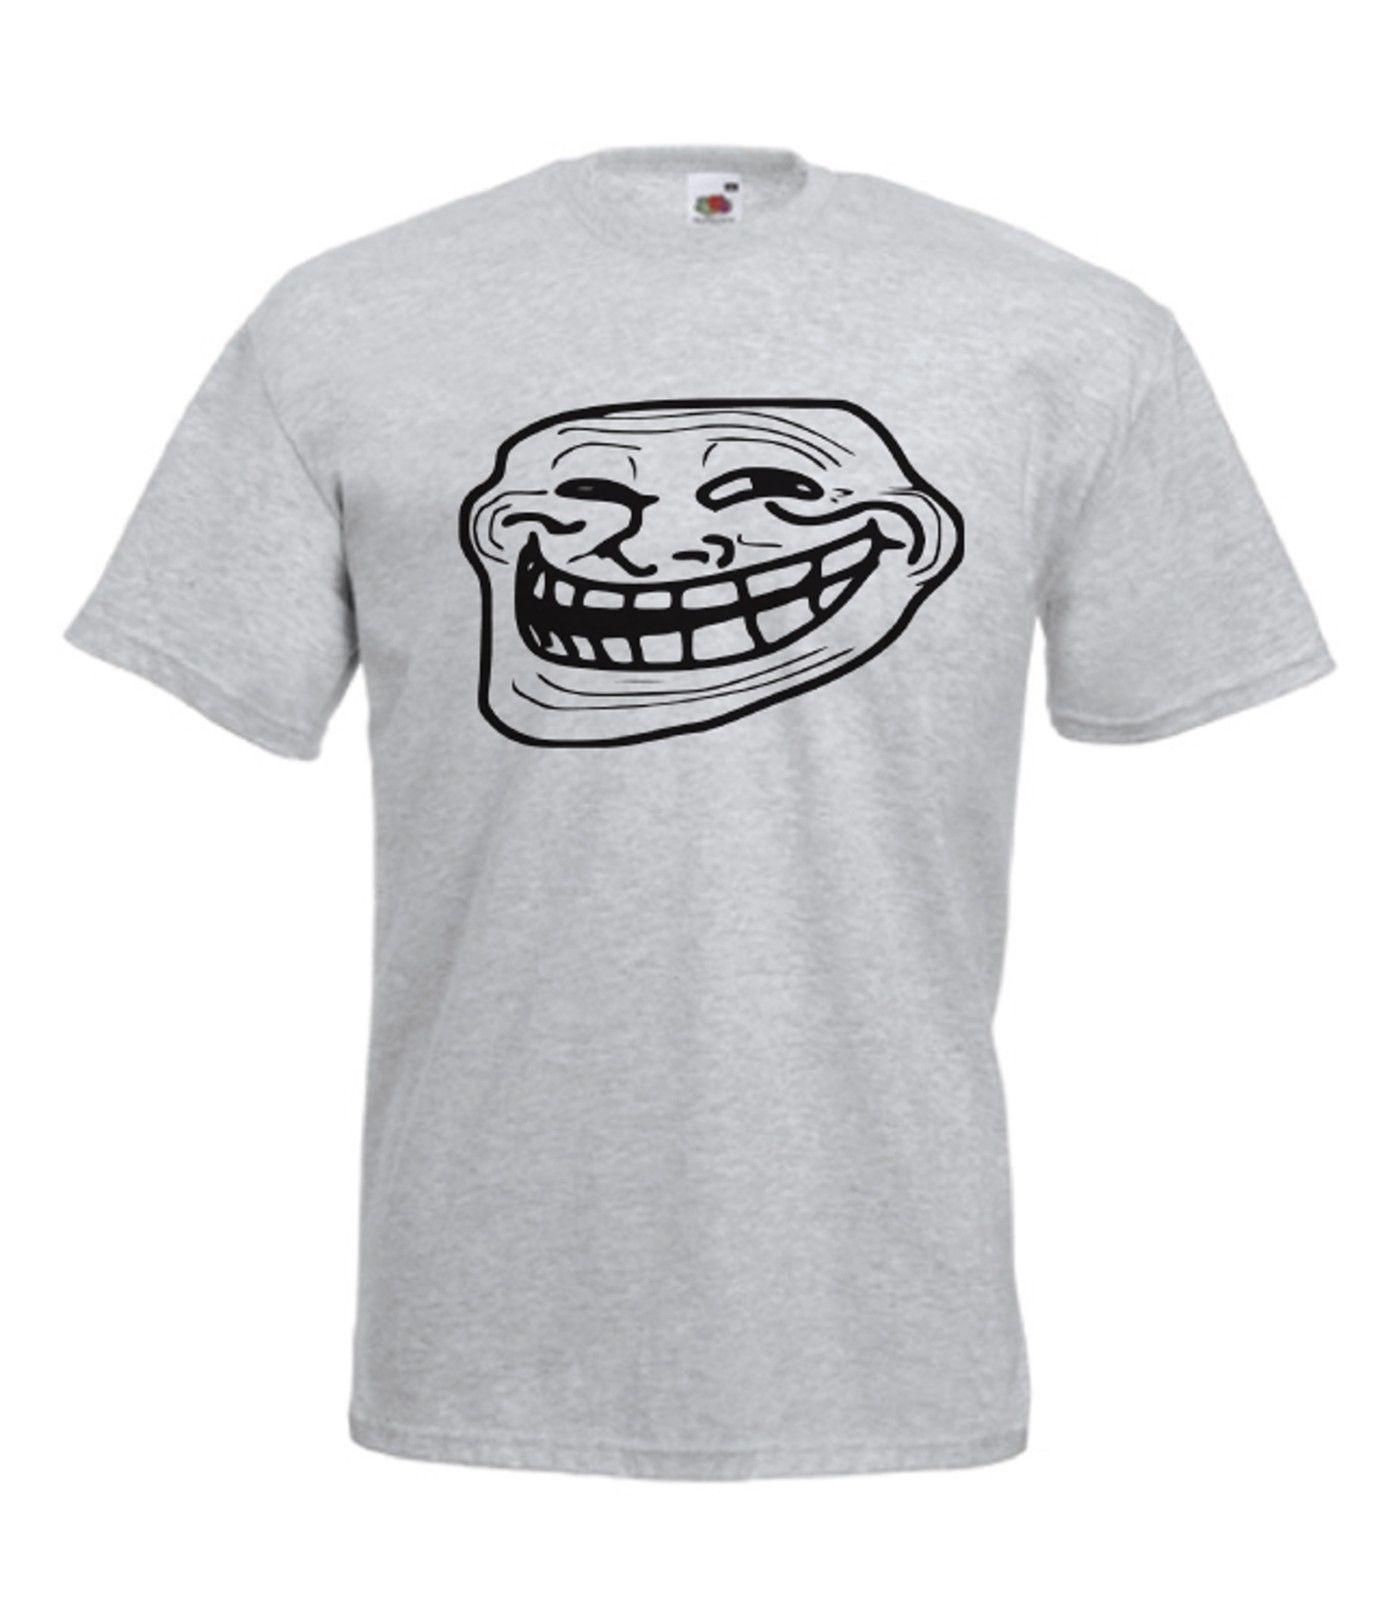 MEME Funny TROLL Nerd FACE NEW Xmas Birthday Gift Ideas Mens Womens T SHIRT TOP Thirts Og Shirt From Capable72 1645